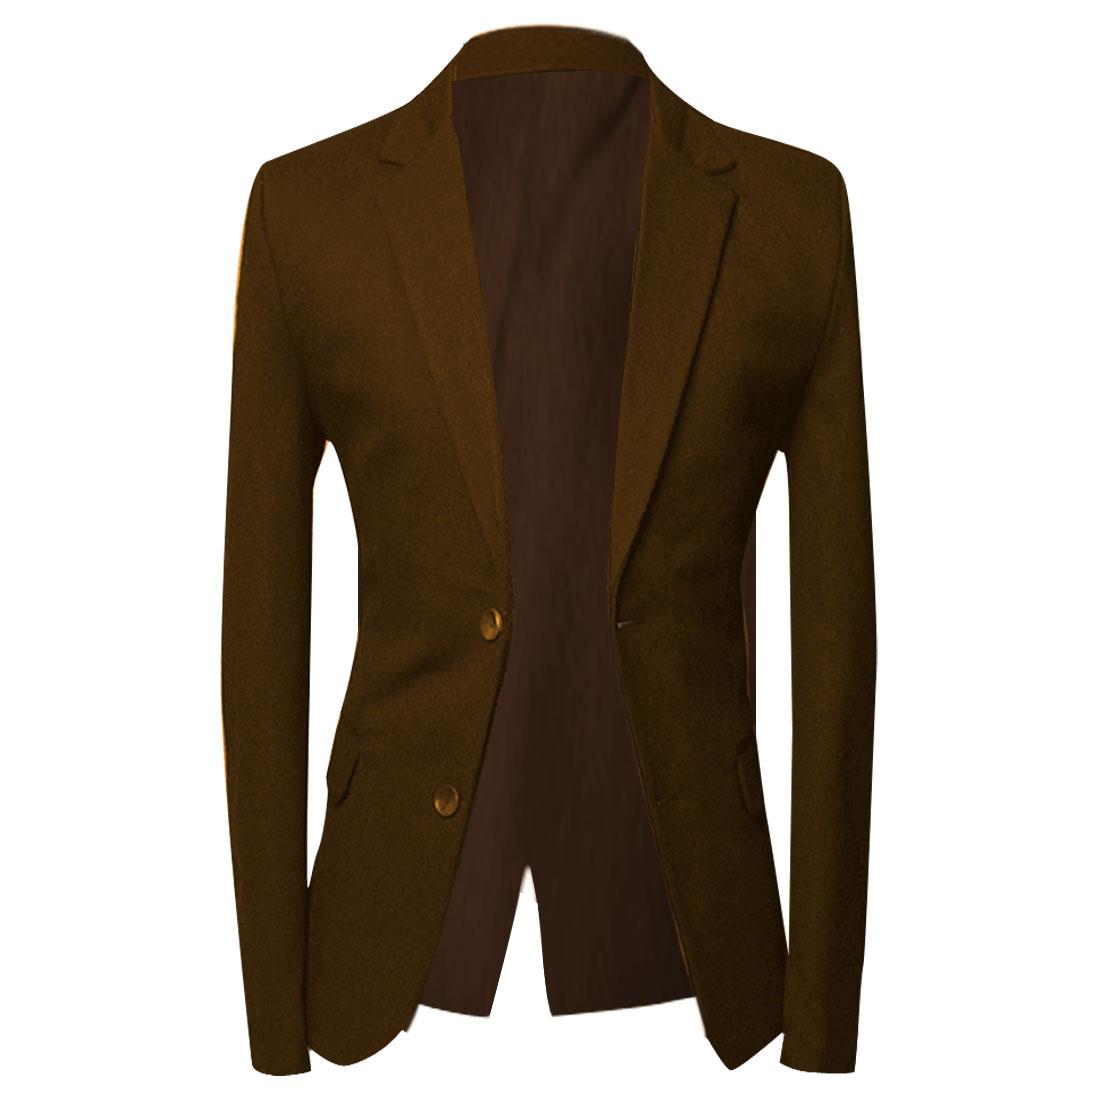 M Brown Button Closure Flap Pockets Slim Fit Design Stylish Men Blazer